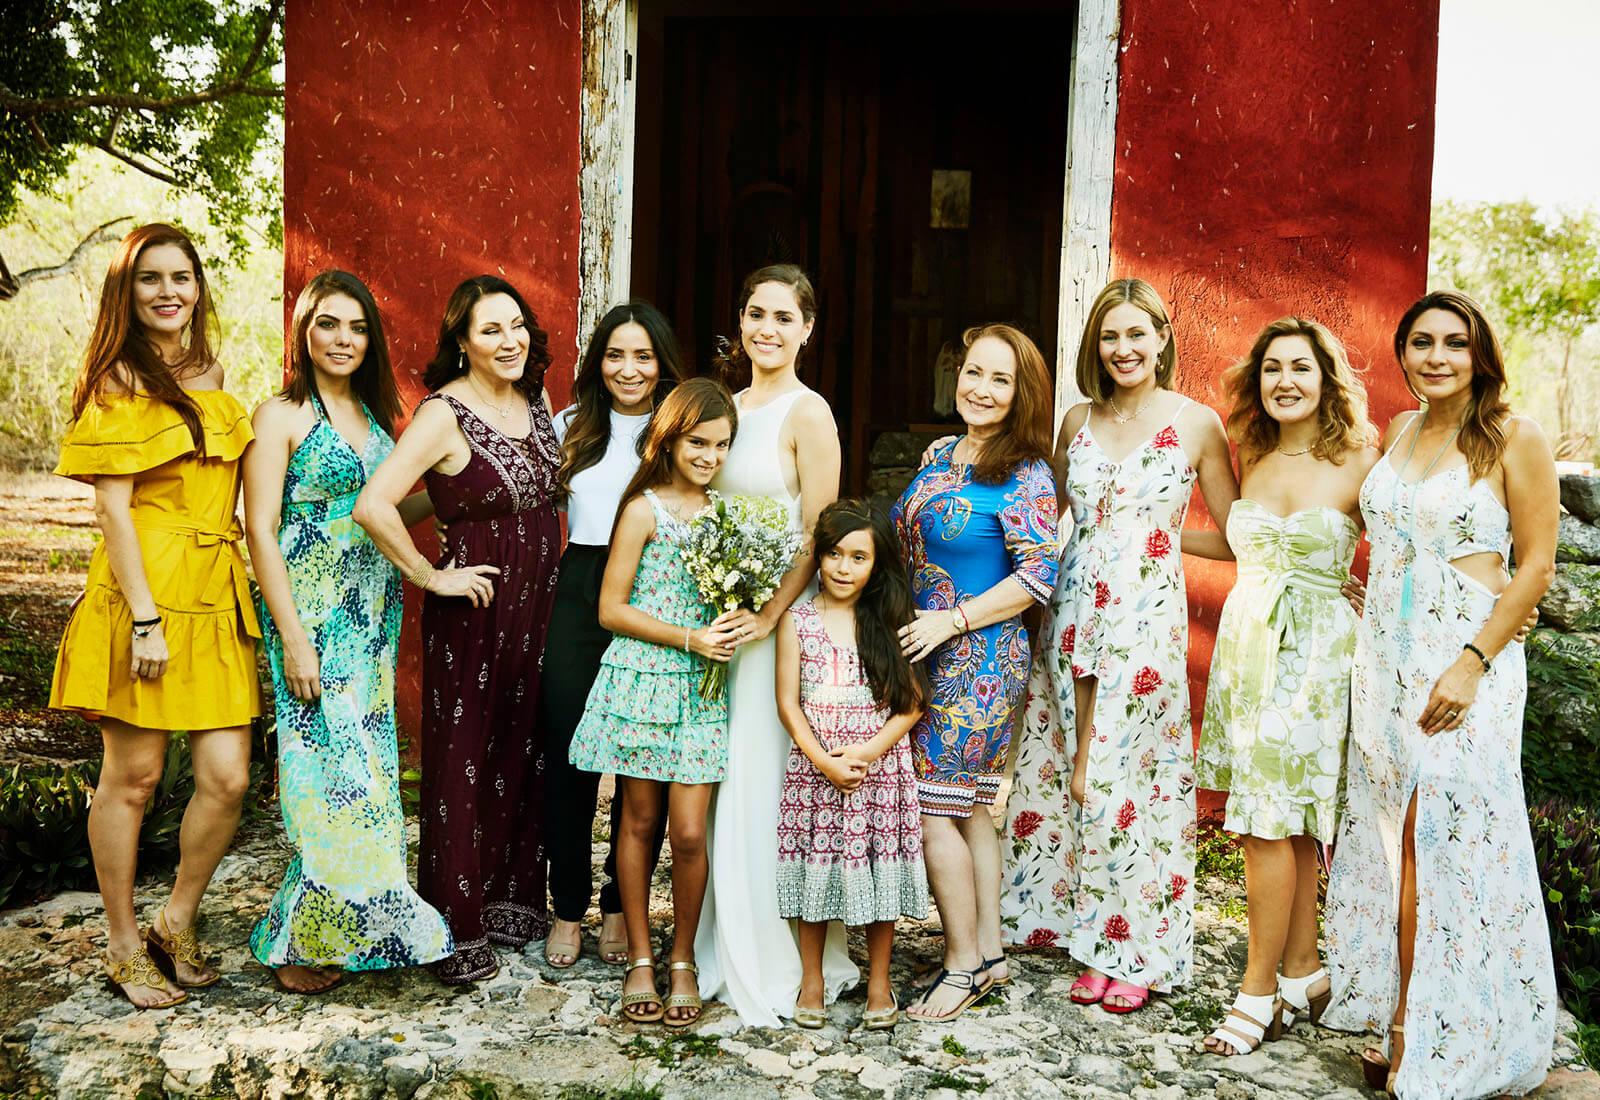 mujeres-invitadas-boda.jpg